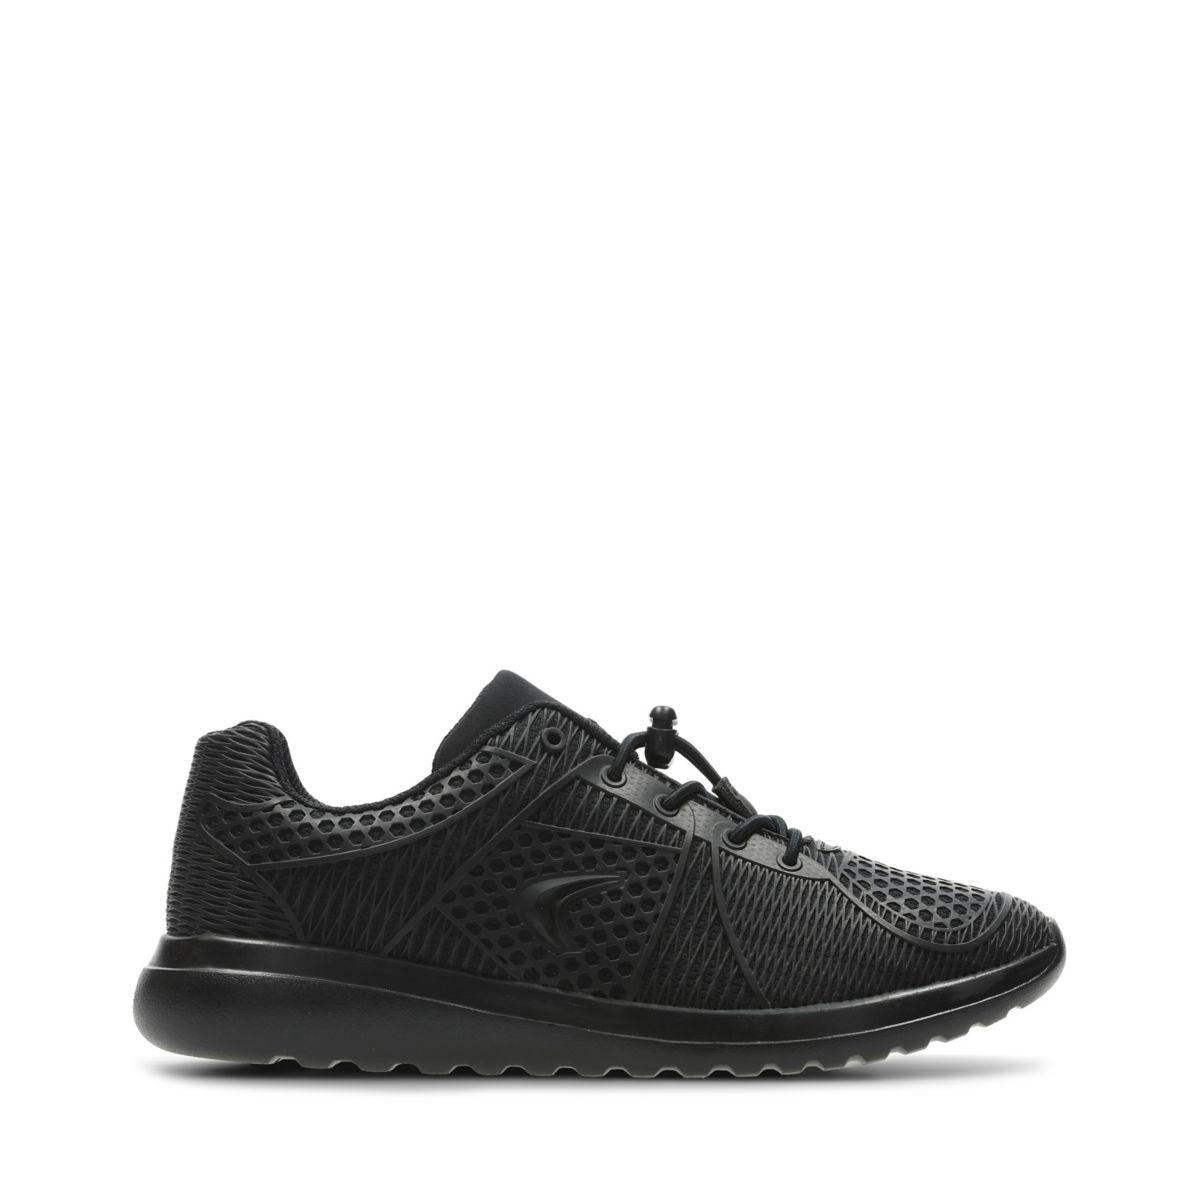 aad071056f8 Clarks Sprint Lane Infant - Kids Sport Shoes Black Multi 11.5 F (Medium)